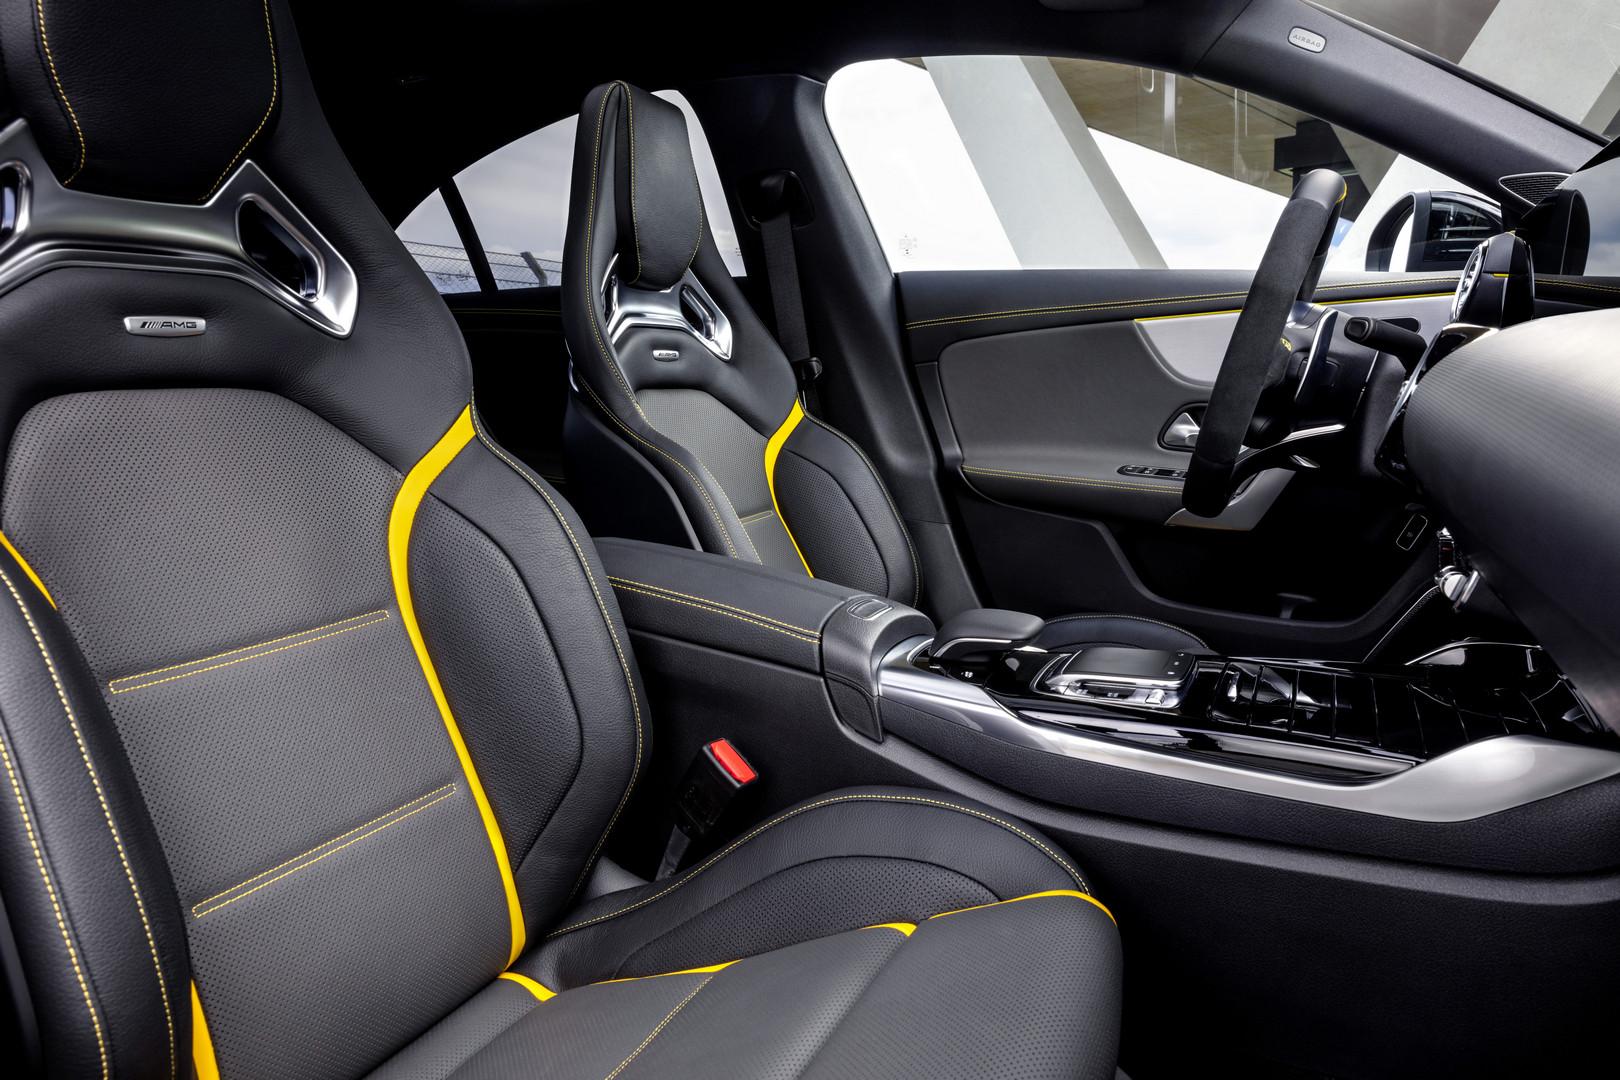 2020 Mercedes-AMG CLA 45 S Seats